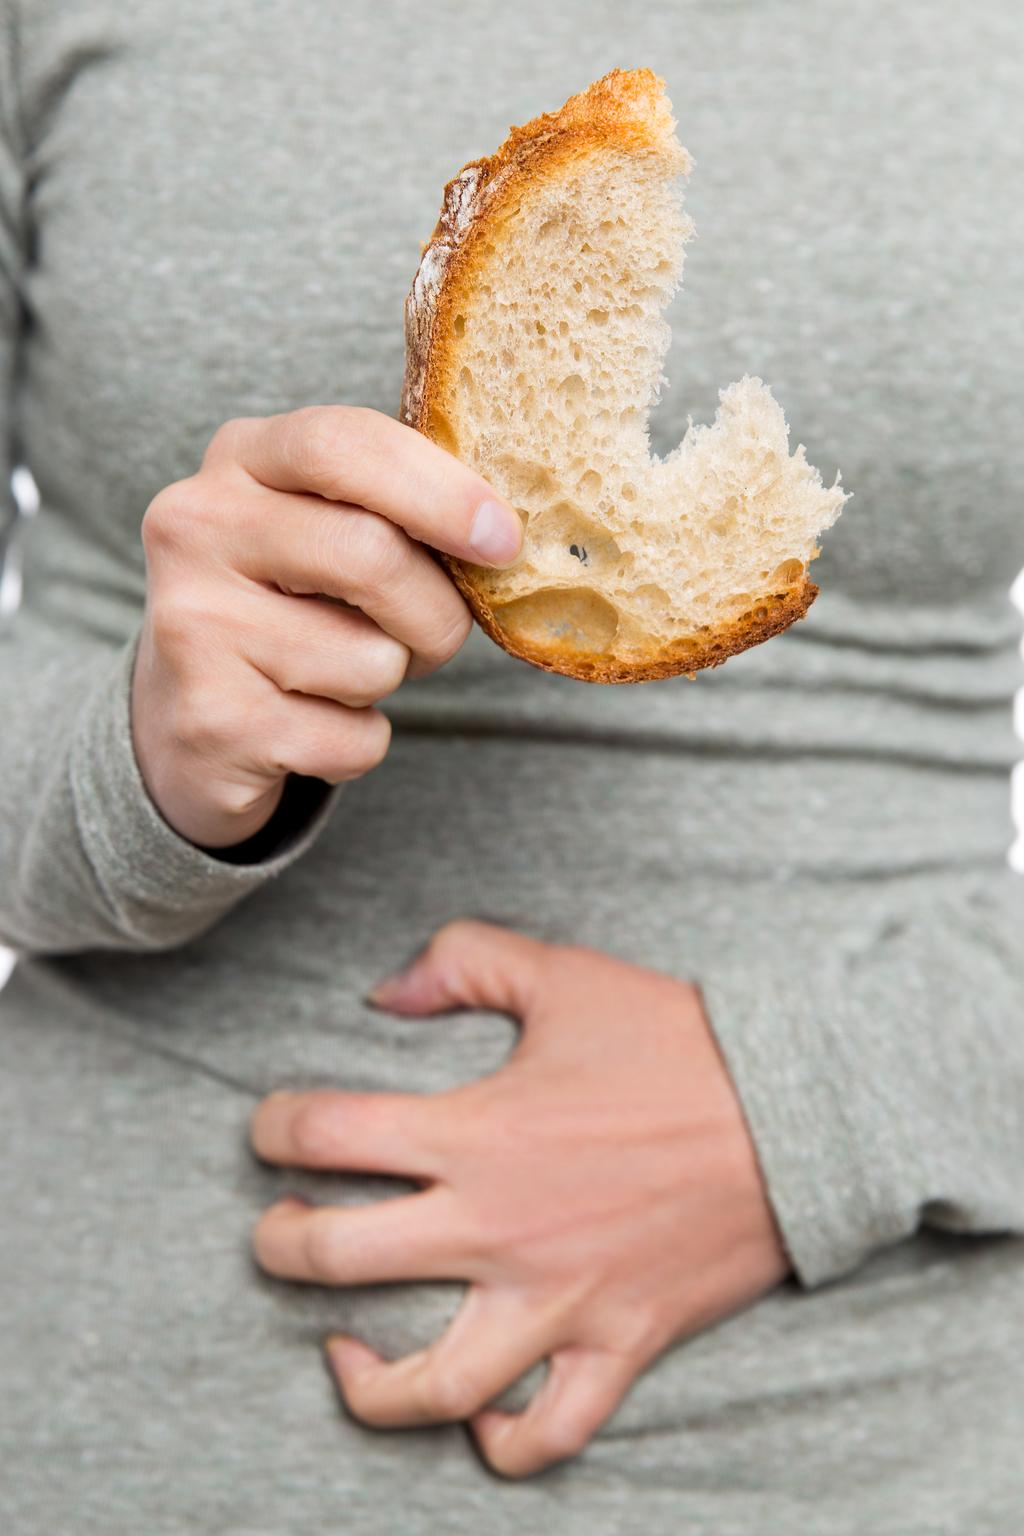 Celiac Disease Your Doctor